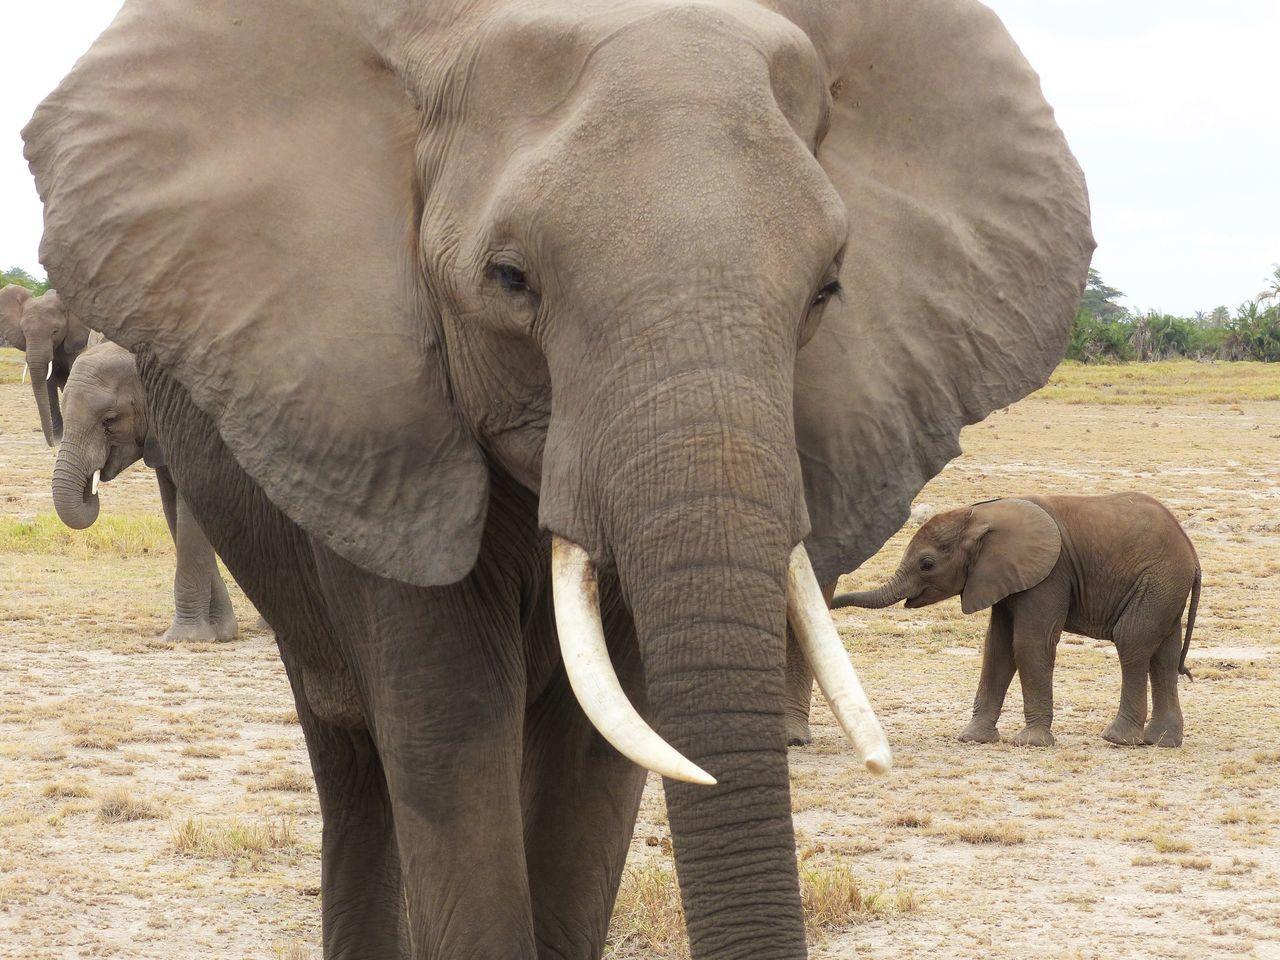 African Elephant Animal Themes Animal Wildlife Animals In The Wild Elephant Landscape Mammal Nature Outdoors Safari Animals Tusk